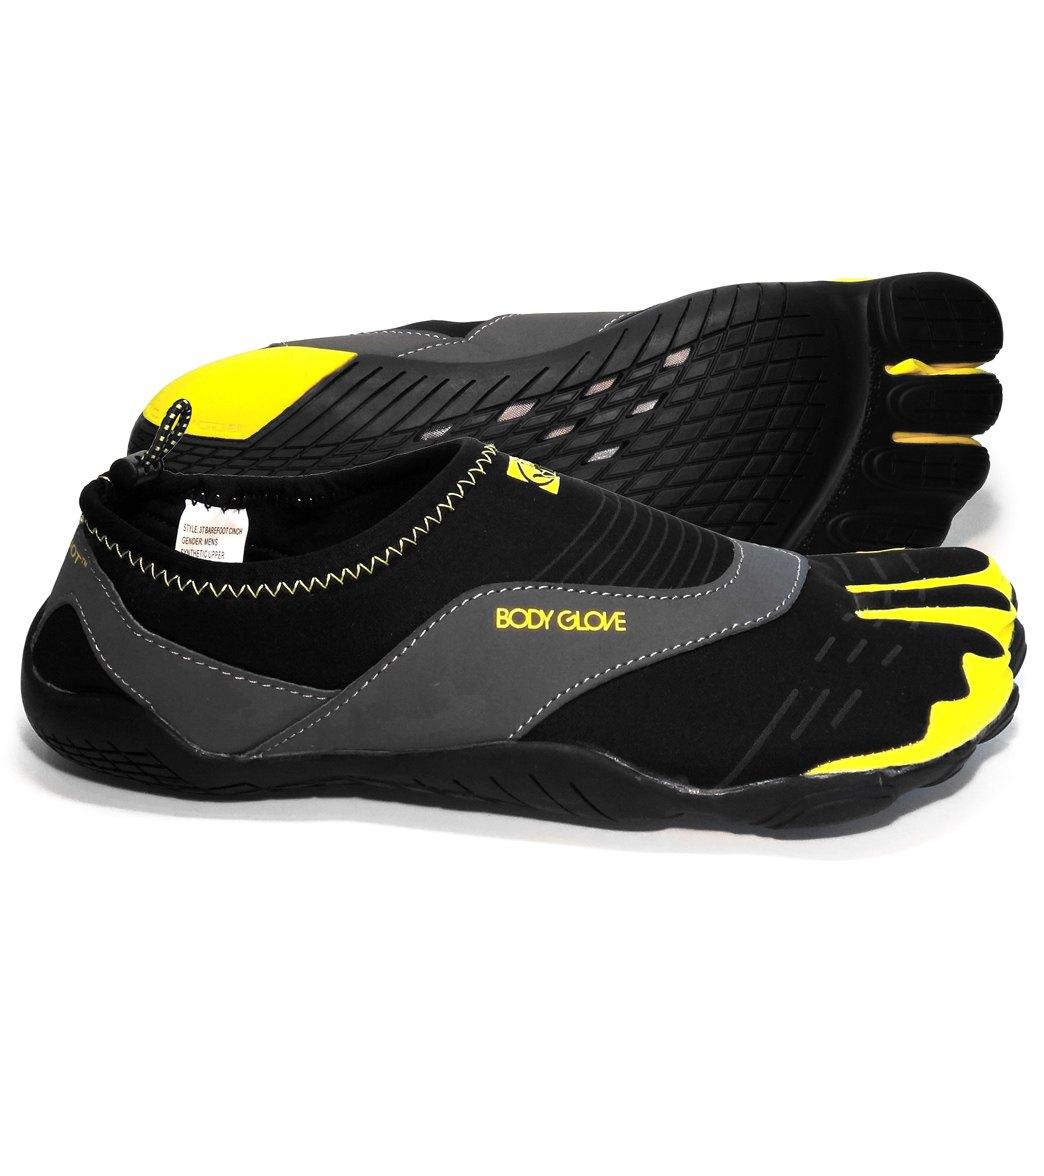 Men's 3T Barefoot Water Shoe